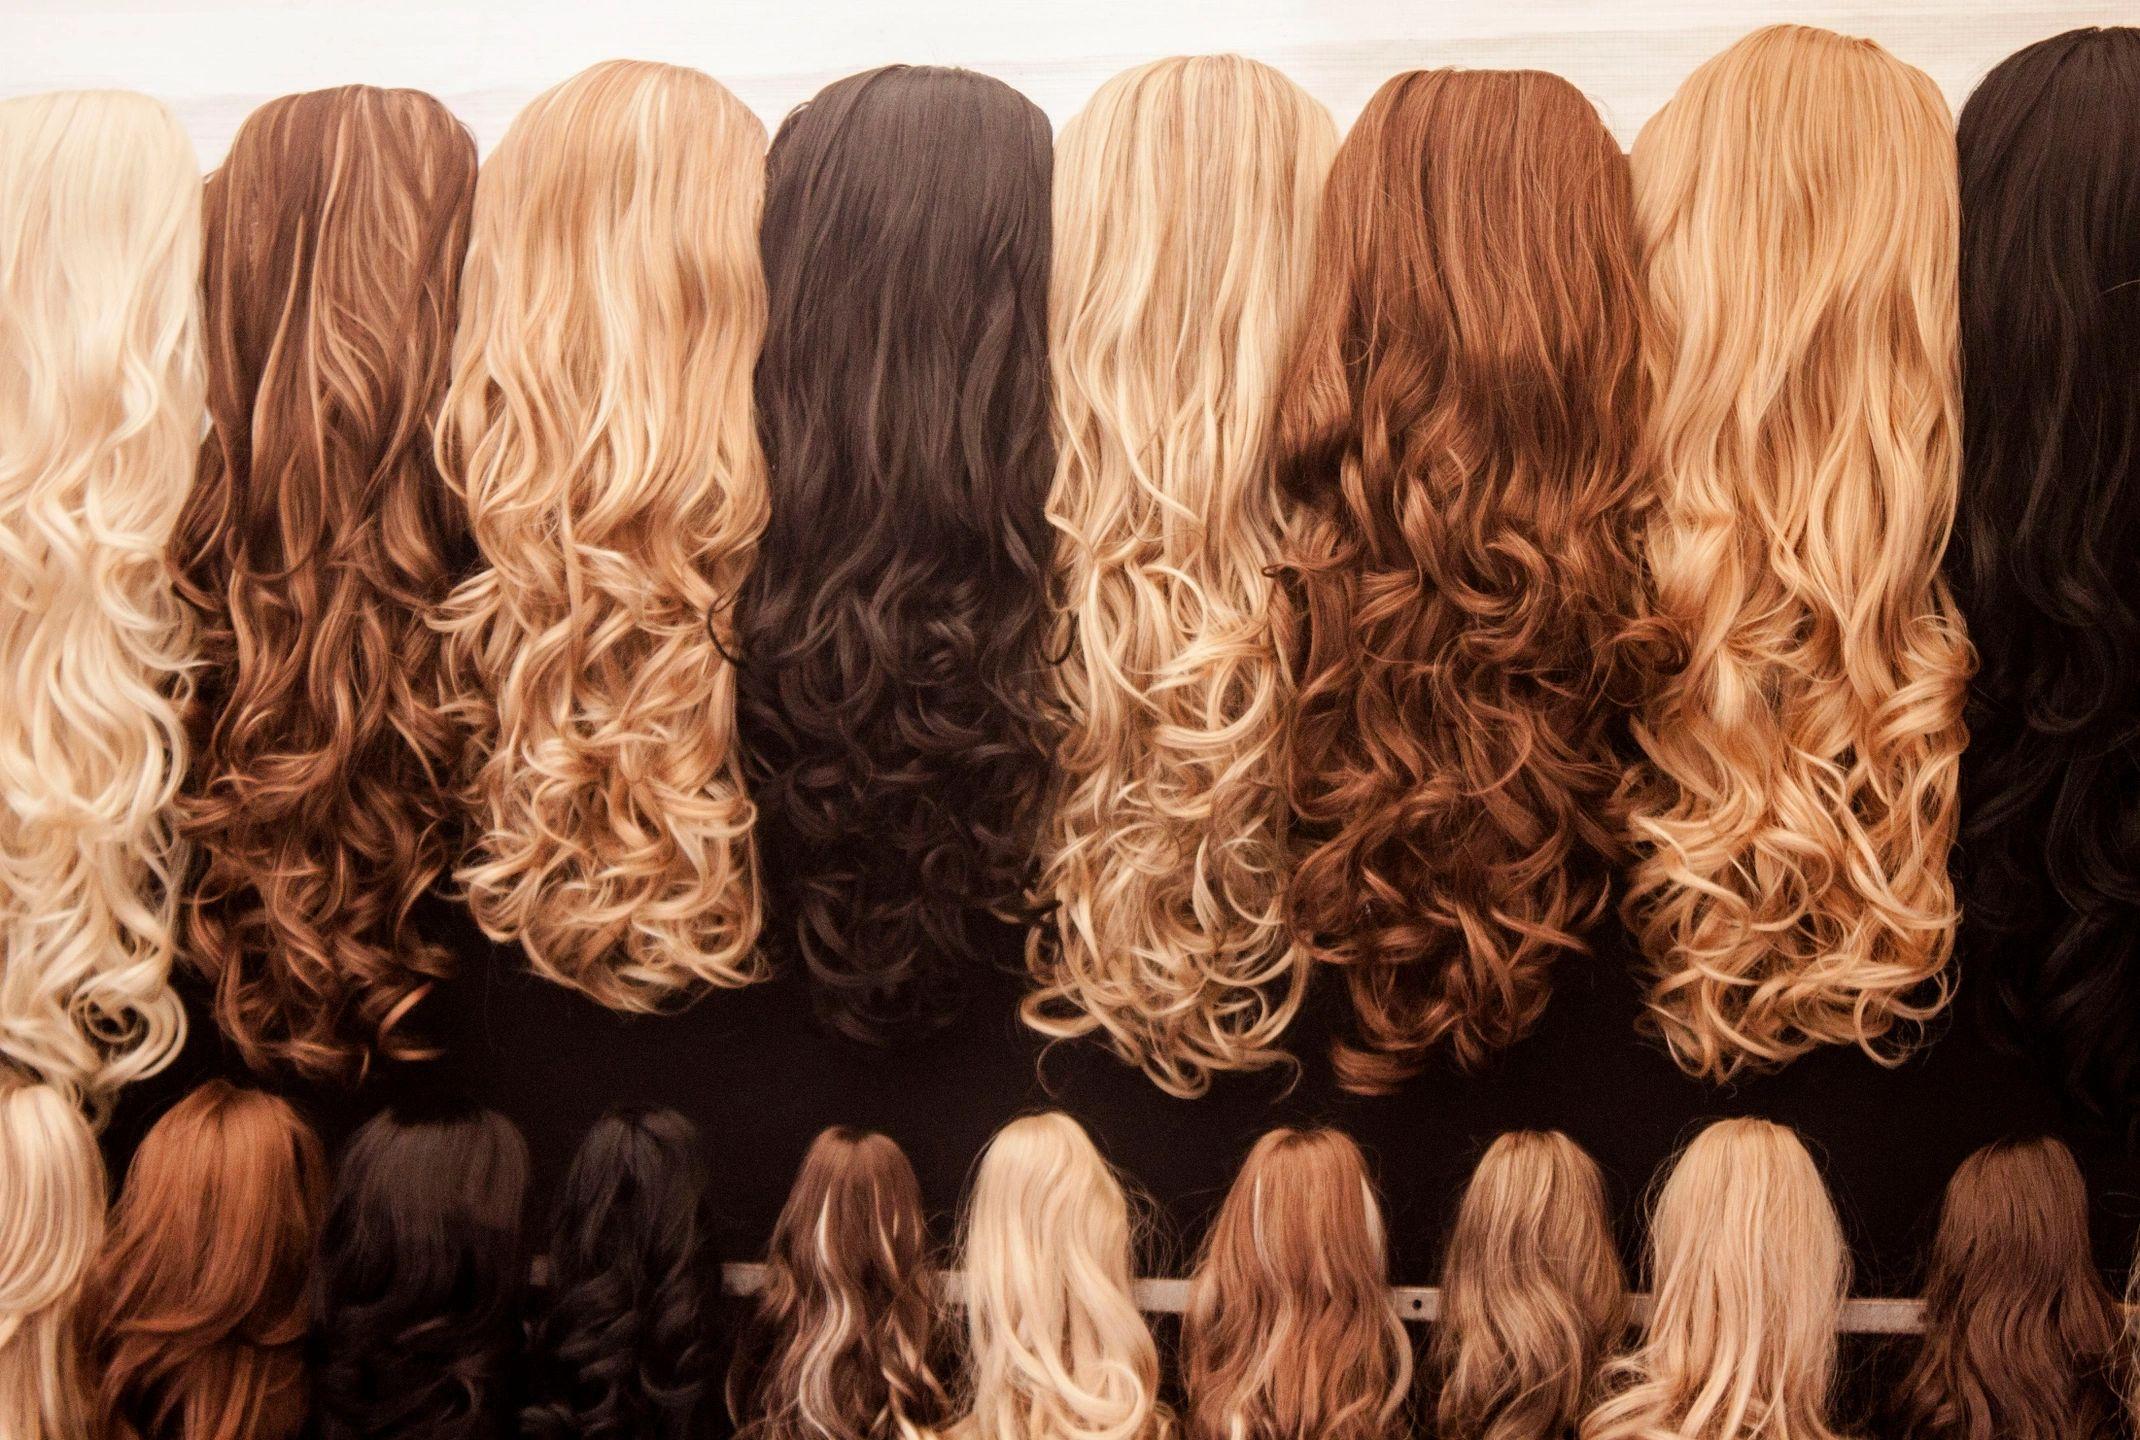 Hair Extensions Salon Pr Hair Extensions